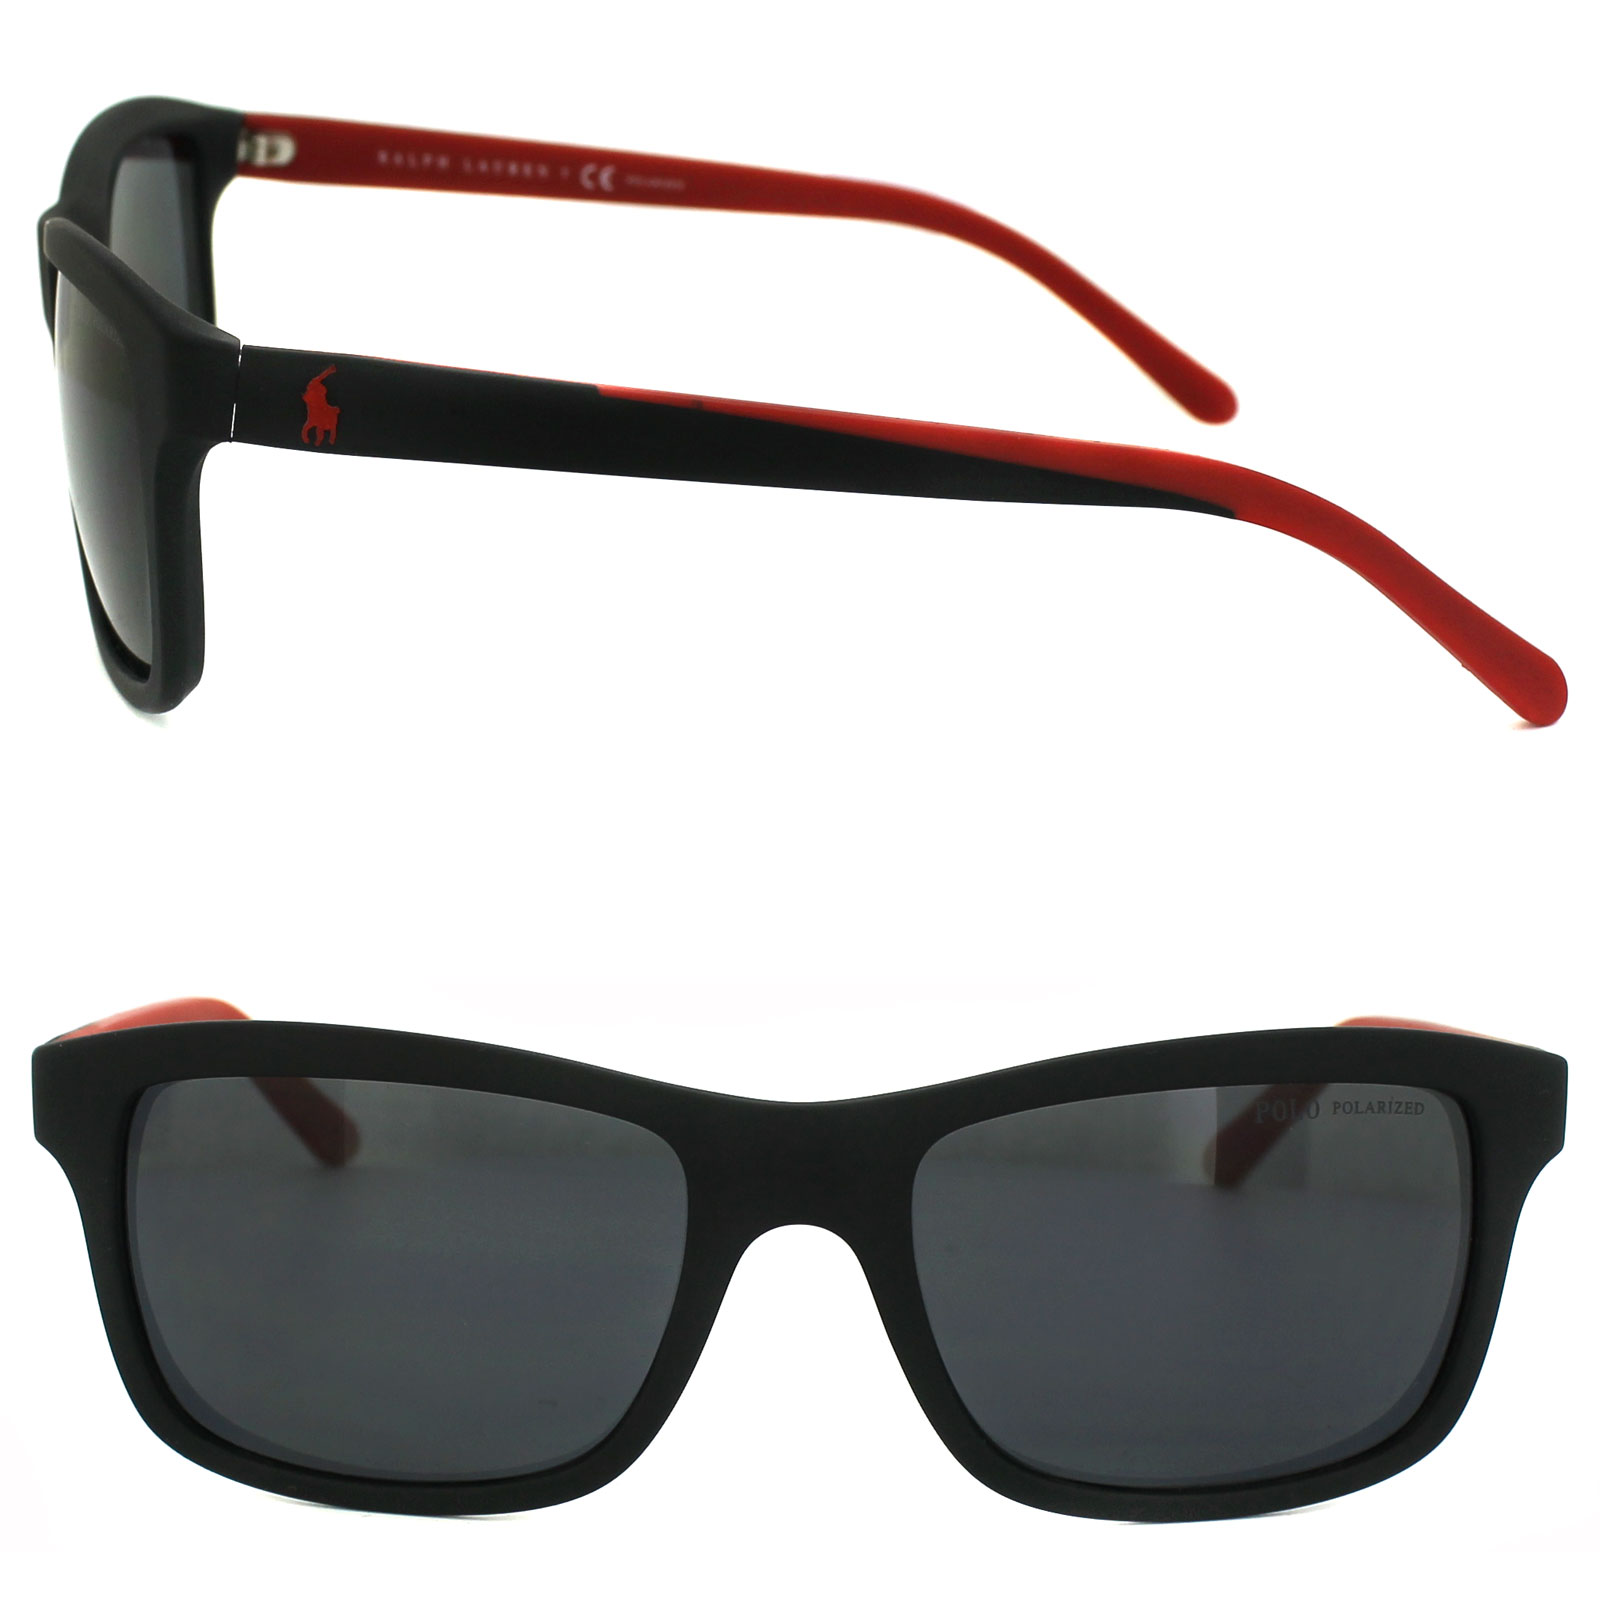 Cheap Polo Ralph Lauren 4095 Sunglasses - Discounted Sunglasses